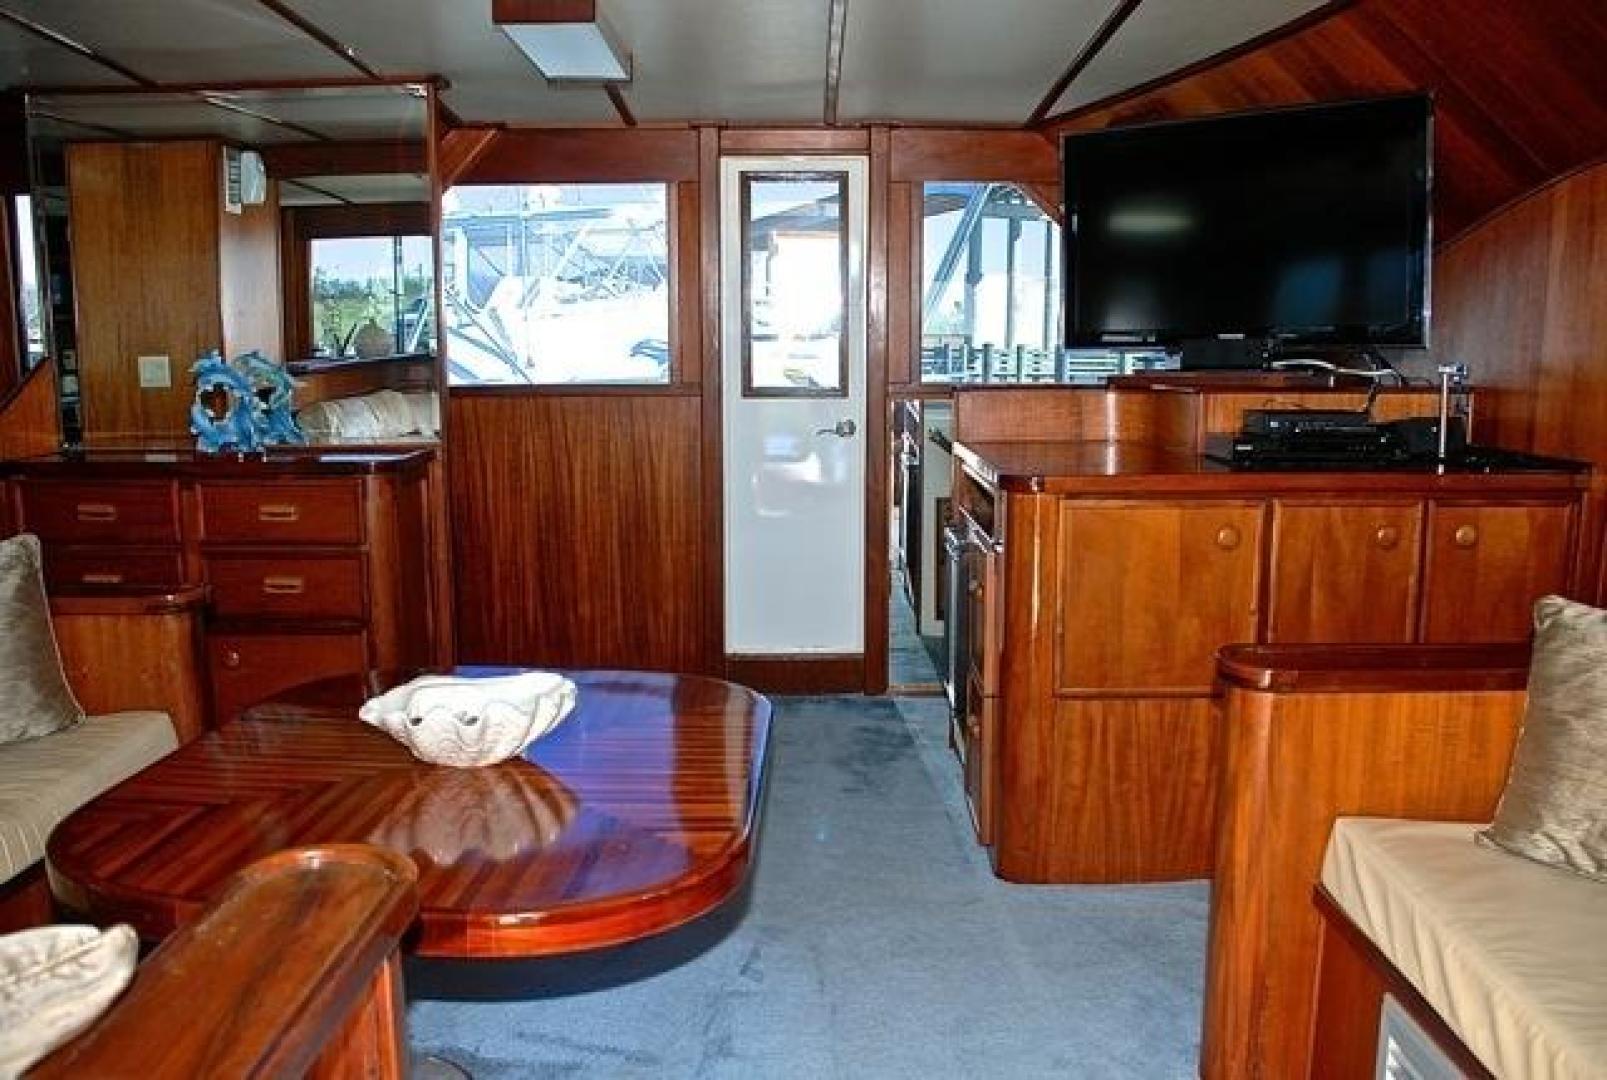 Infinity-Cockpit Motor Yacht 2001-Dont Matter Houston-Texas-United States-Salon View 3-1005539 | Thumbnail